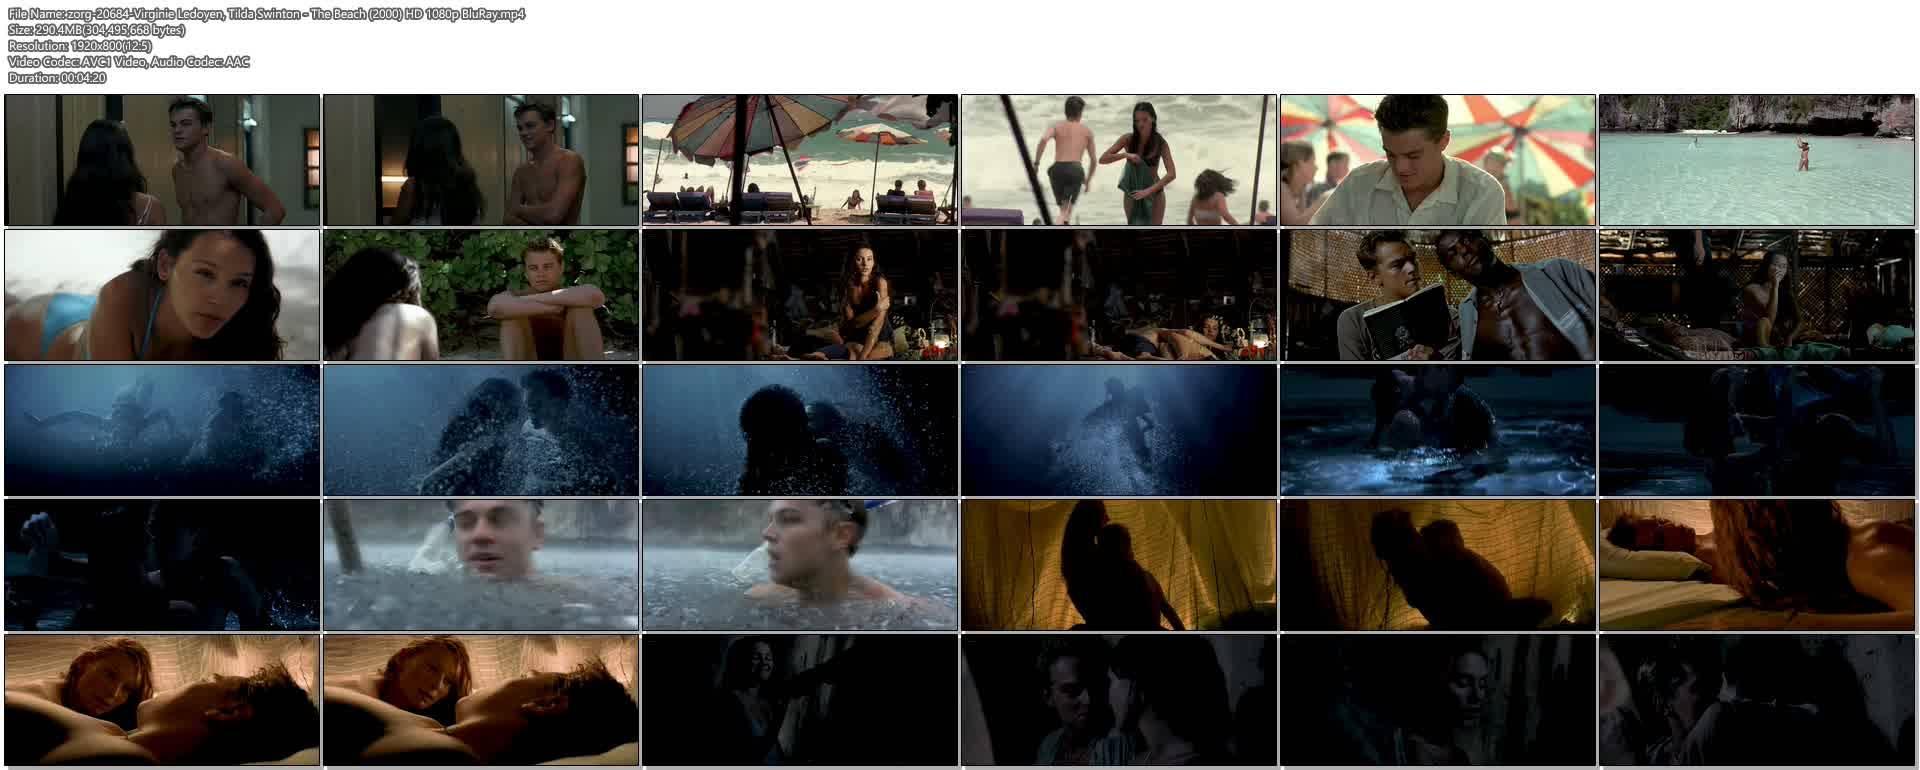 Virginie Ledoyen nude topless Tilda Swinton hot sex - The Beach (2000) HD 1080p BluRay (1)